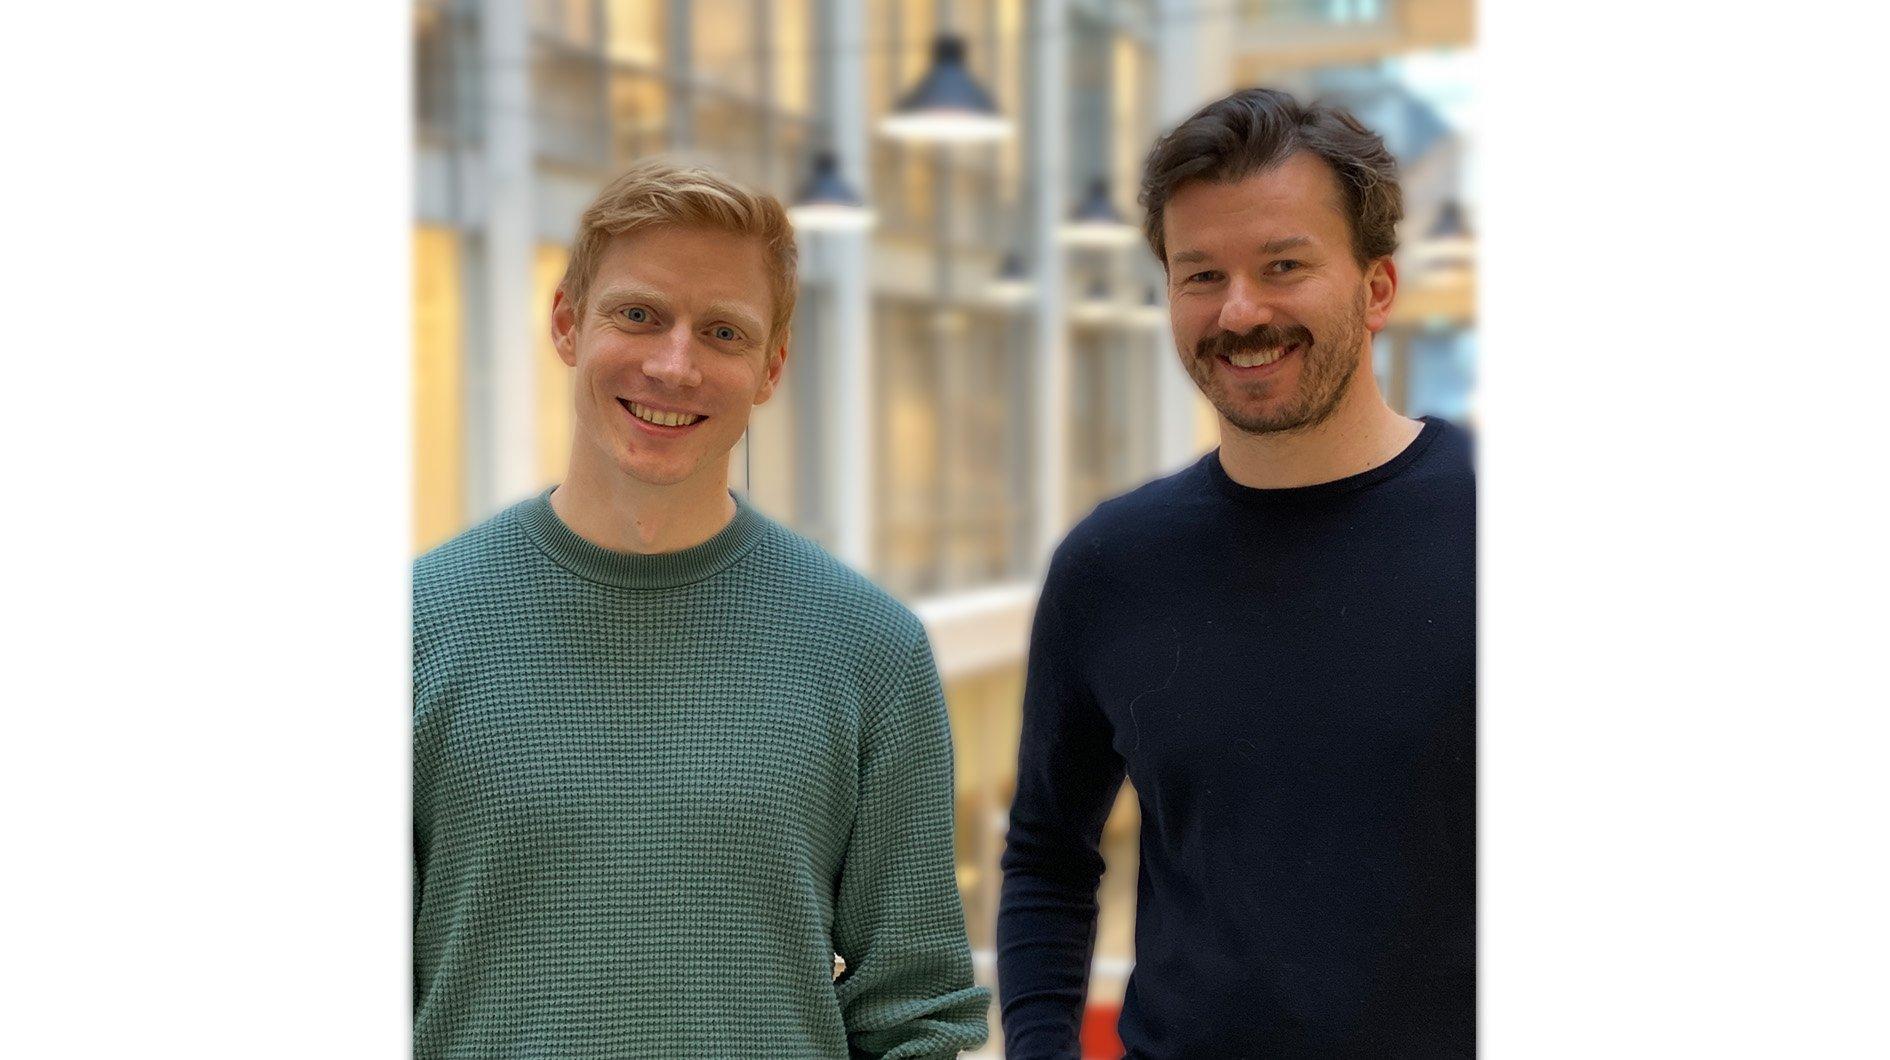 Photo: Intelecy - Andreas og Bertil